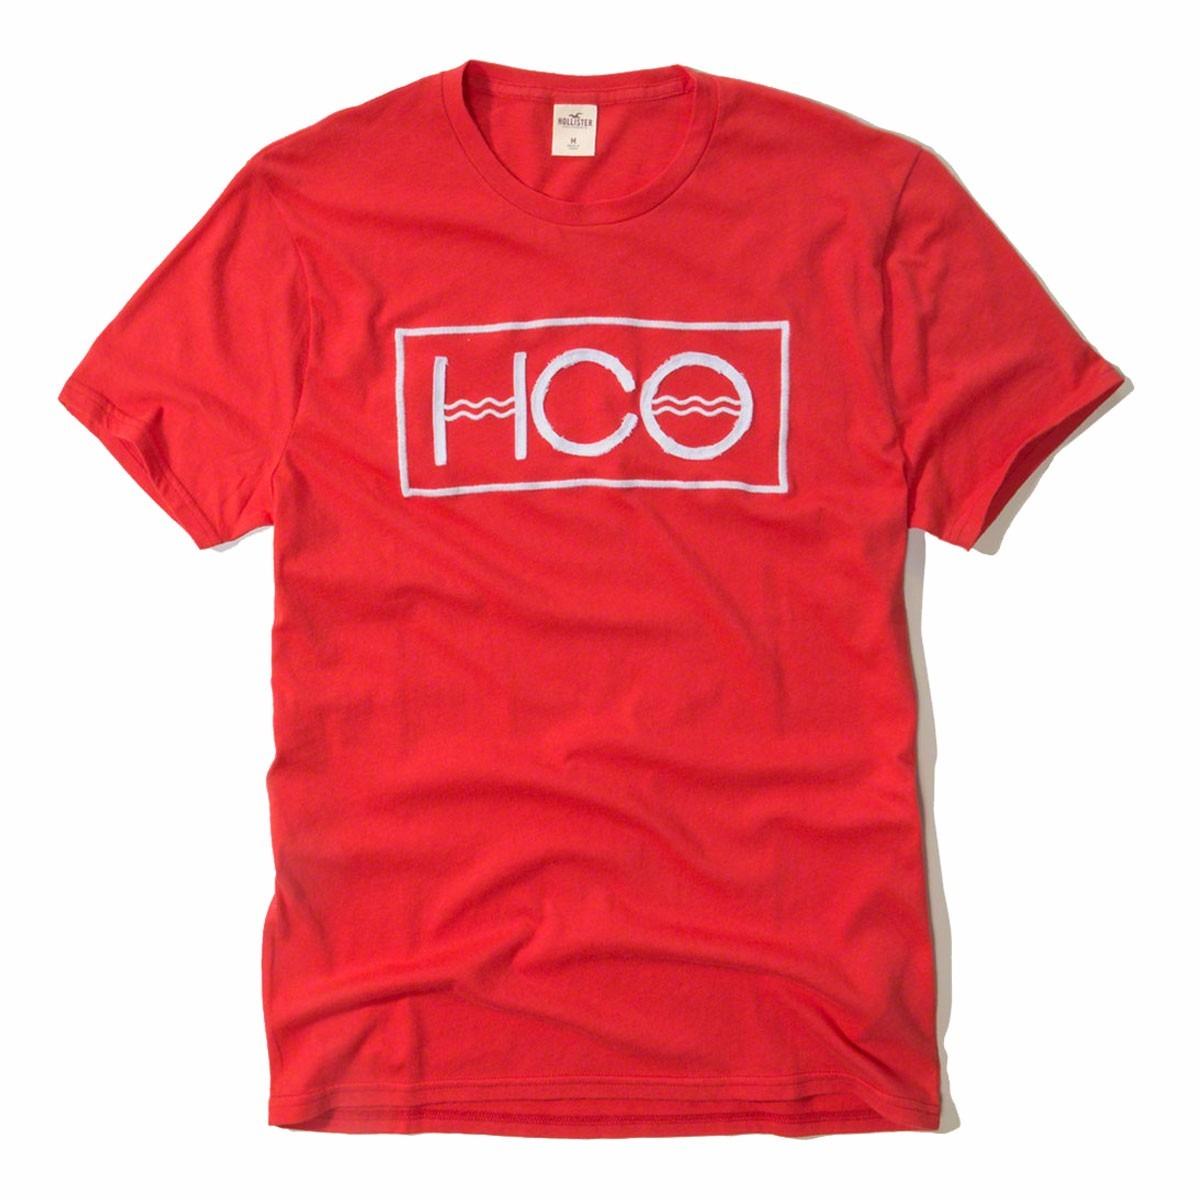 05eef09409 Camiseta Hollister Masculina Irada 100% Original - Tam G P54 - R  126